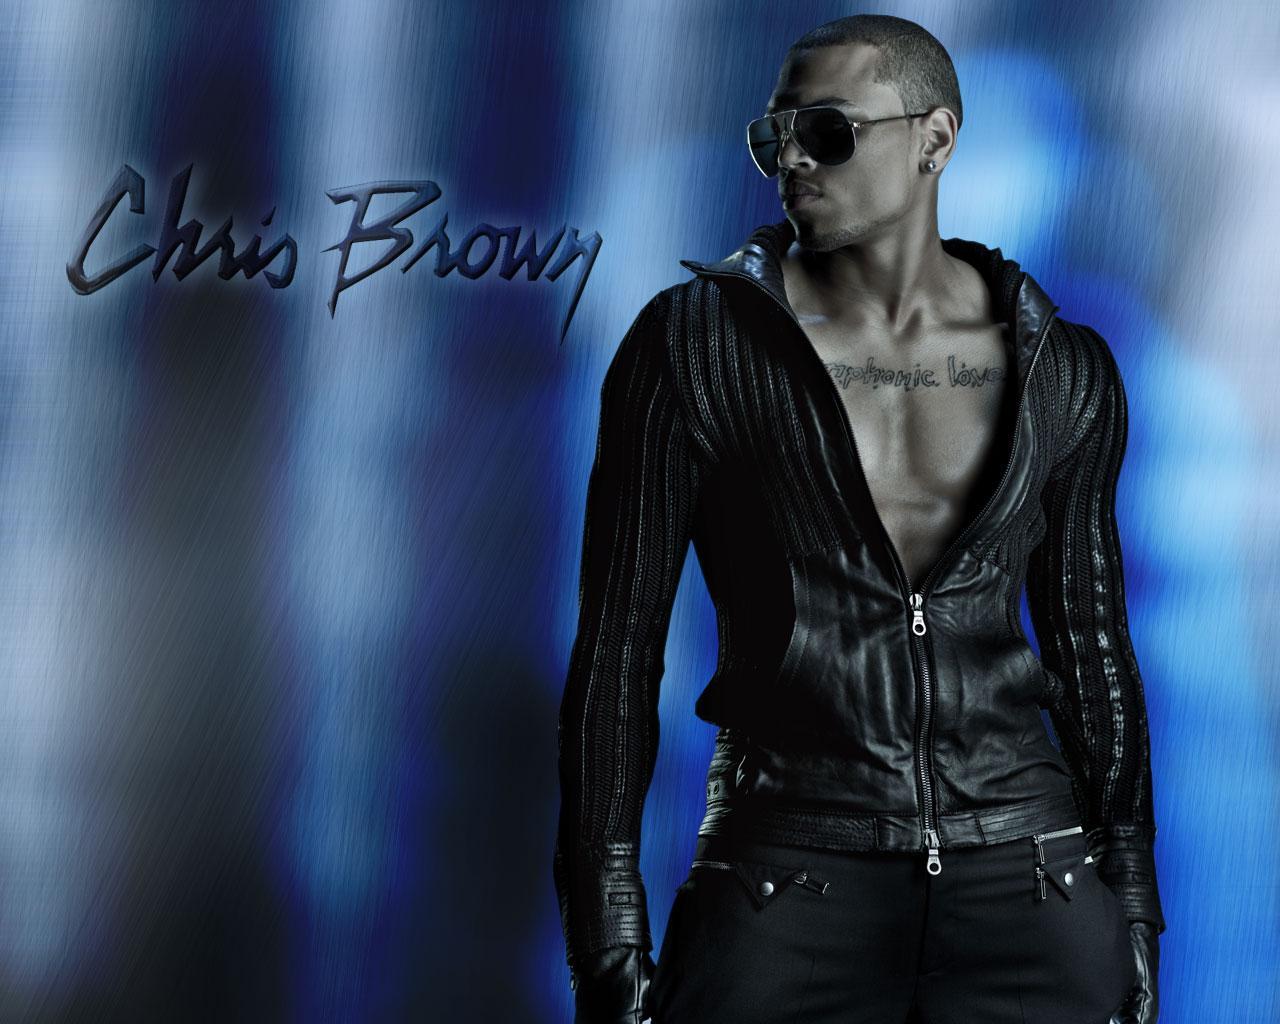 http://3.bp.blogspot.com/_H0uIwgk-kRY/TPG07Yt2zDI/AAAAAAAAA28/Nl3SUL3TzXY/s1600/Chris+Brown+%25233+-+1280x1024.jpg